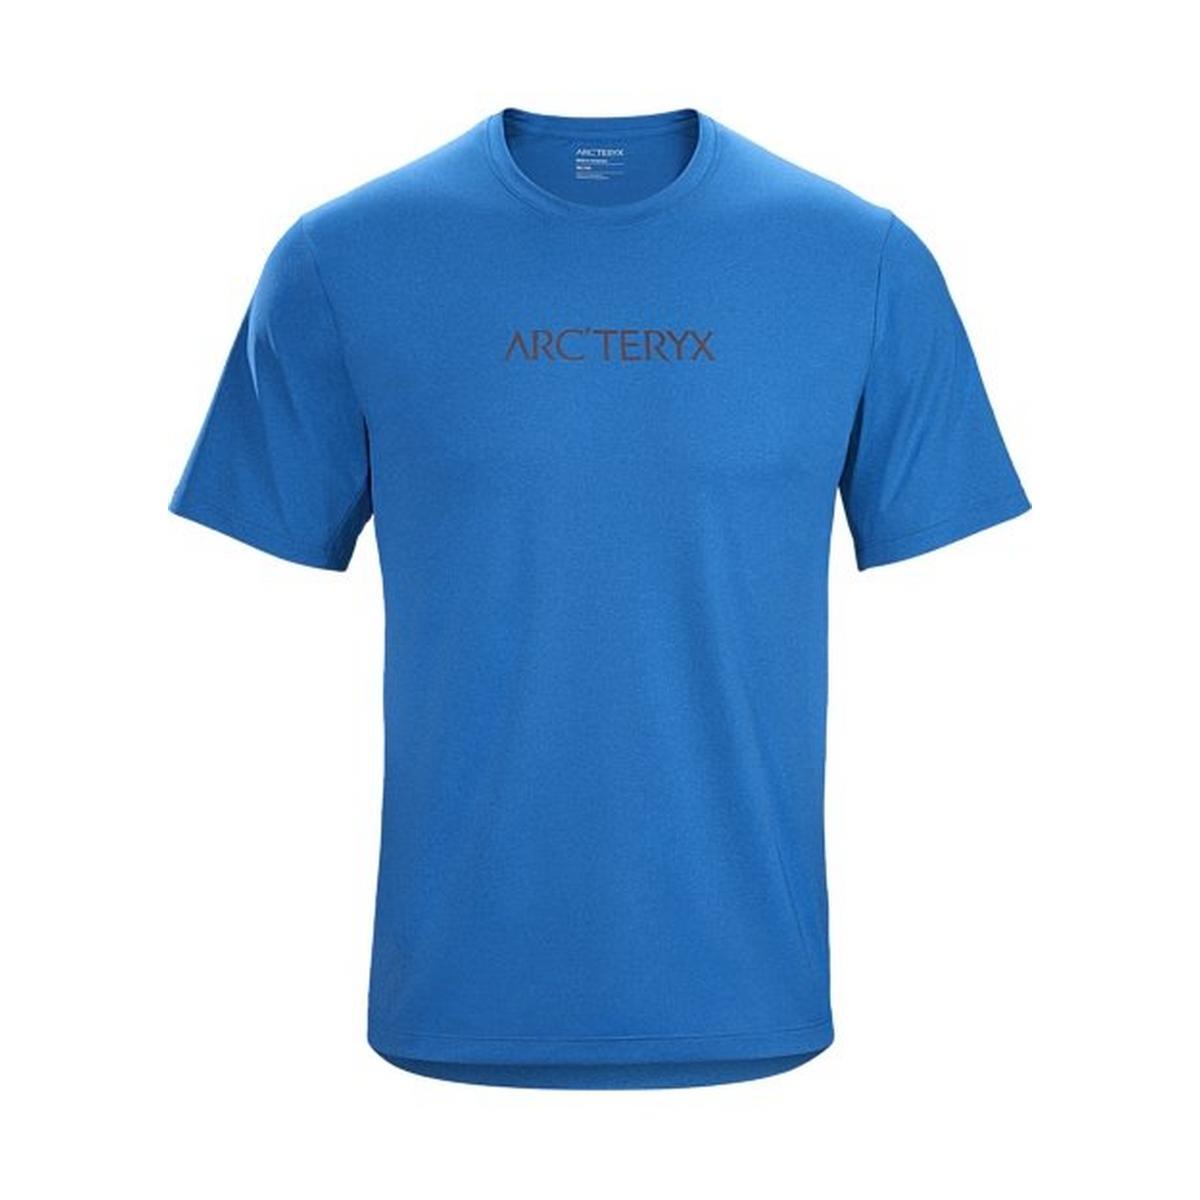 Arcteryx Arc'teryx Men's Remige Word T-Shirt SS - Blue